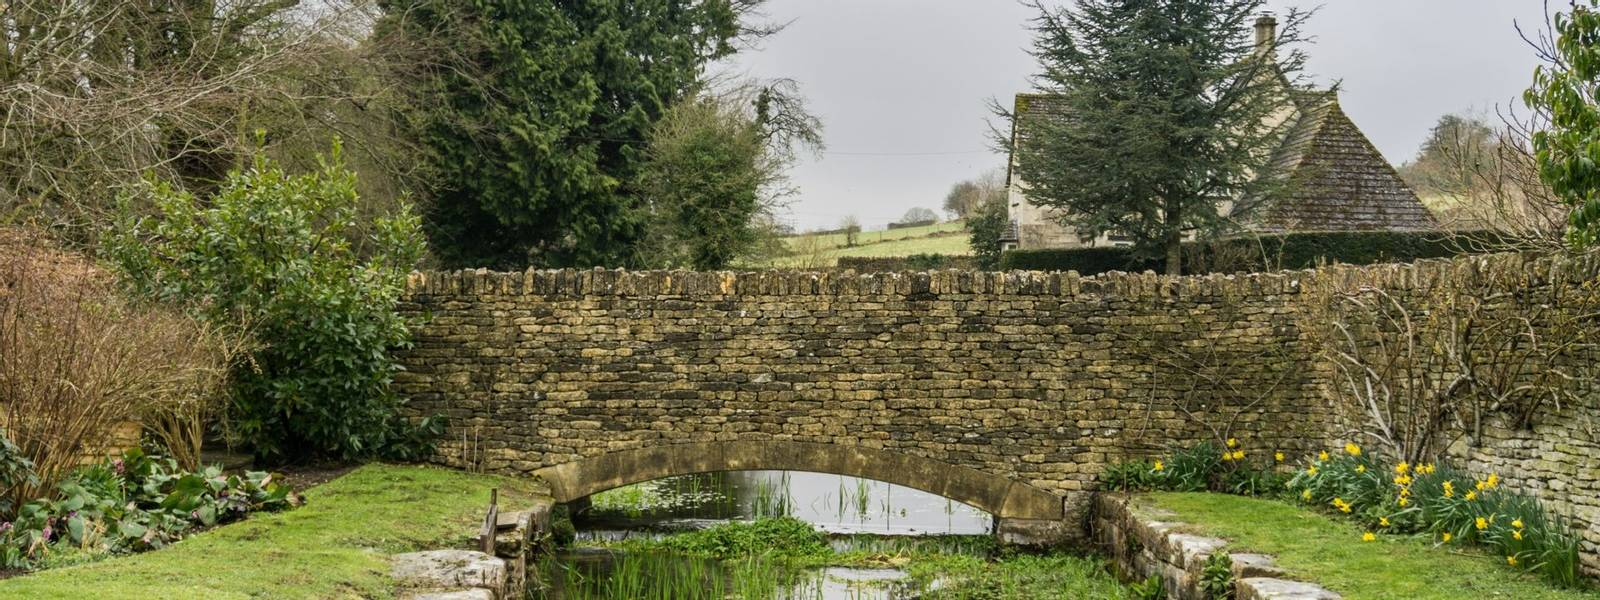 Bourton - Cotswolds - Gentle Guided -  AdobeStock_200963697.jpeg